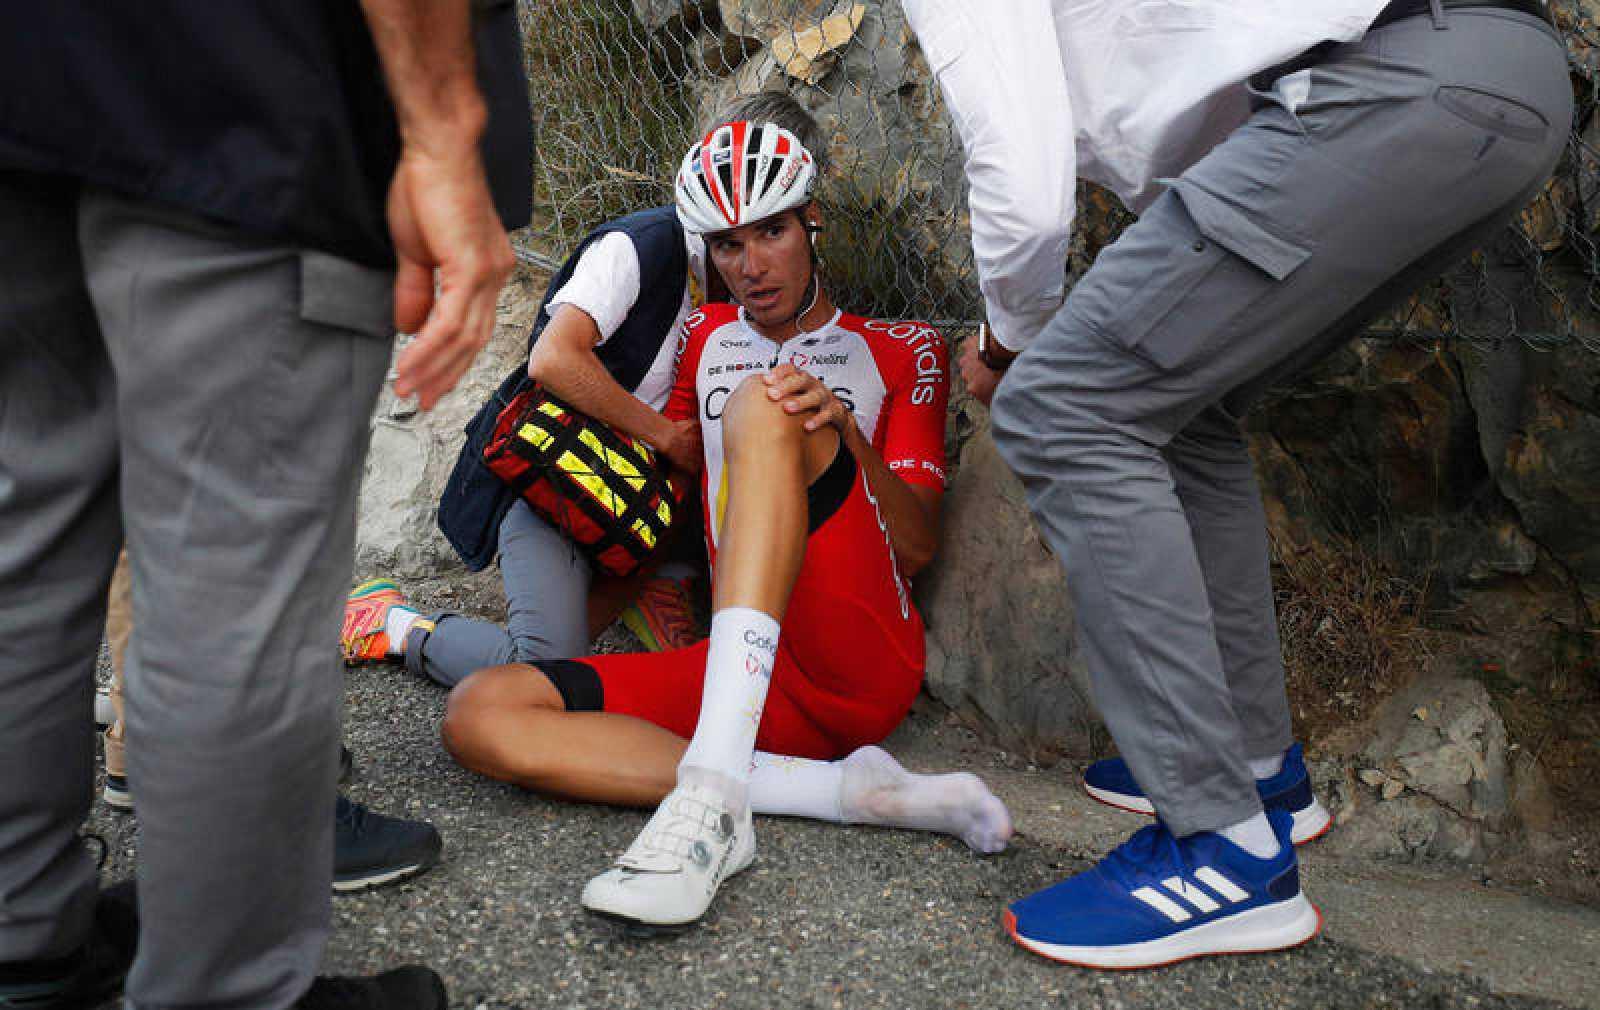 Imagen del ciclista Anthony Pérez (Cofidis) tras la caída que le obligó a abandonar el Tour de Francia 2020.